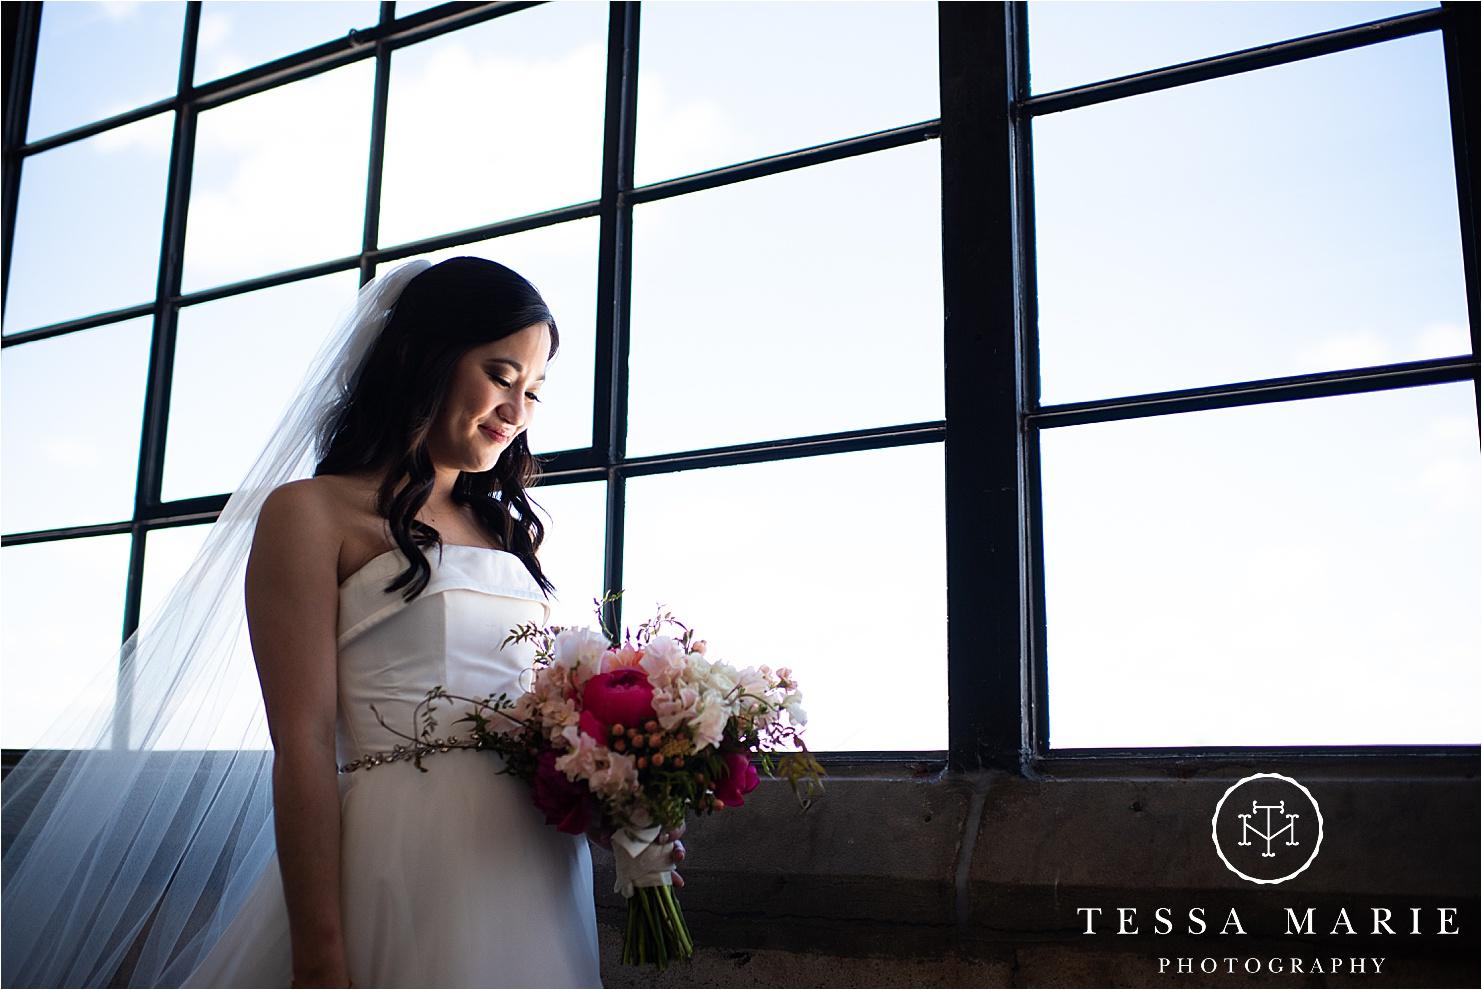 Tessa_marie_weddings_houston_wedding_photographer_The_astorian_0041.jpg